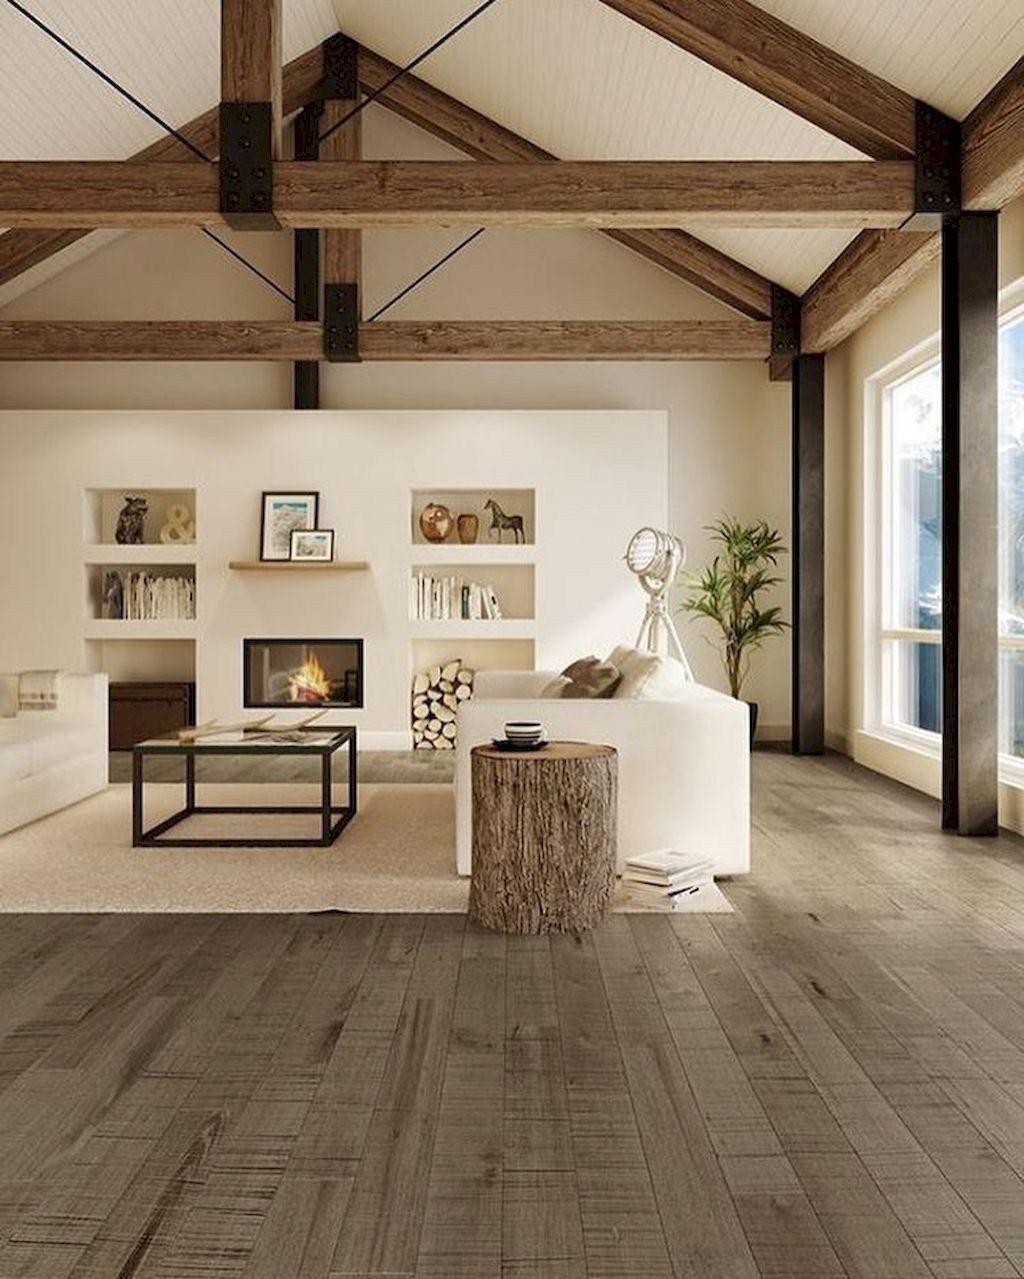 46 Stunning Rustic Living Room Design Ideas: Beautiful Modern Farmhouse Living Room Decor Ideas 32